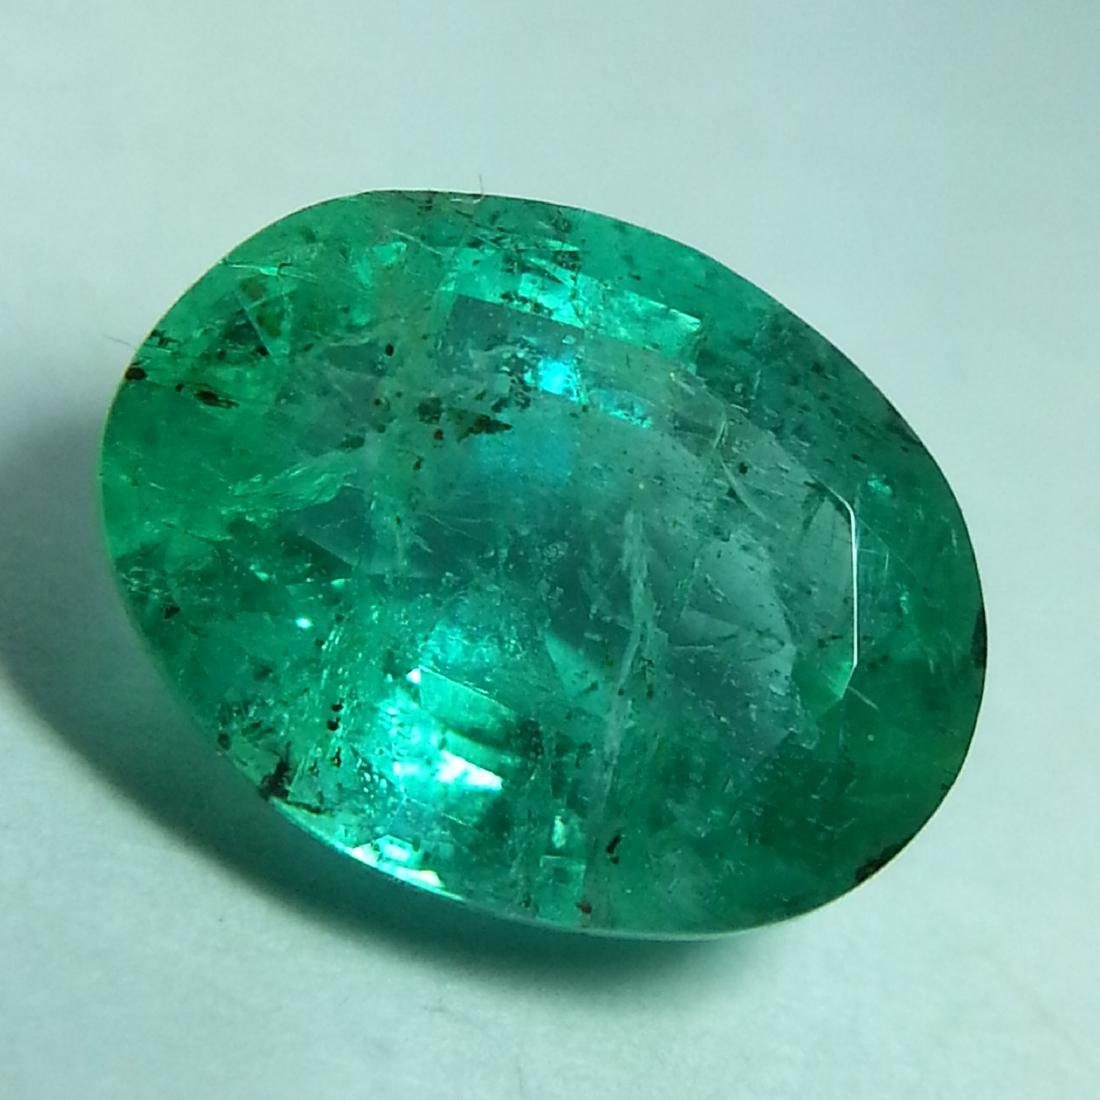 Natural Emerald - 1.96 ct